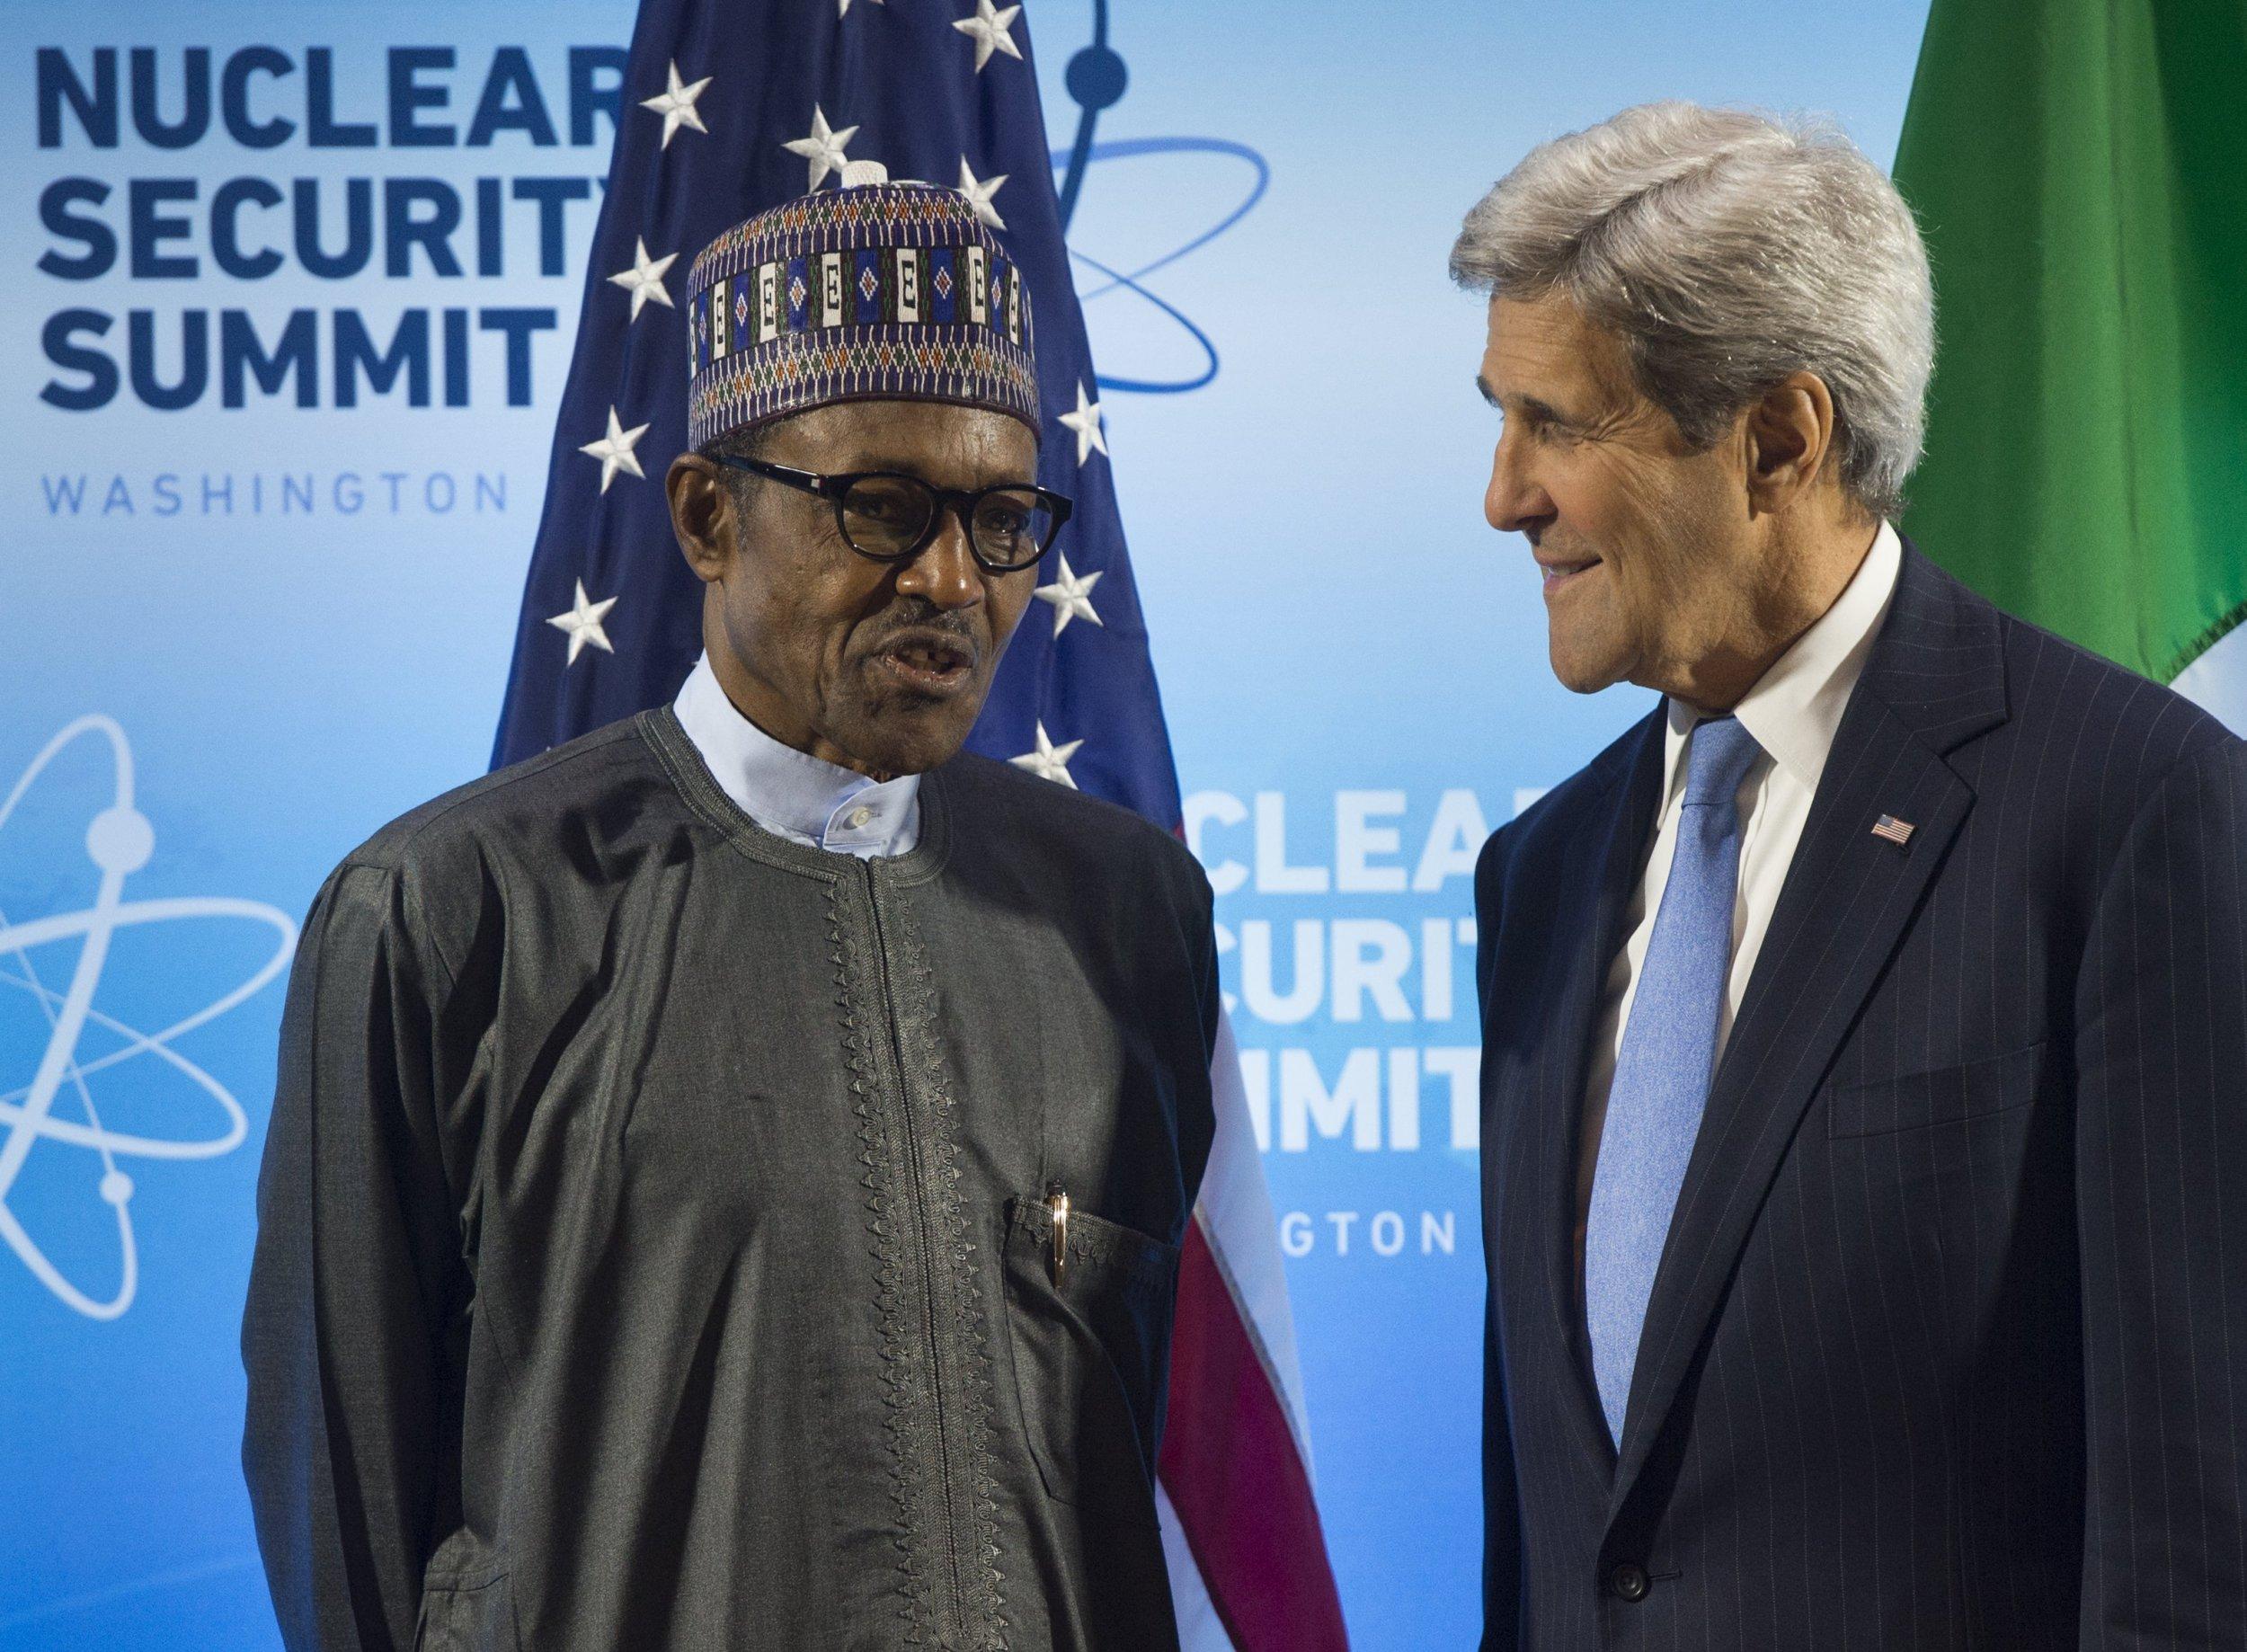 Nigerian President Muhammadu Buhari speaks with U.S. Secretary of State John Kerry.